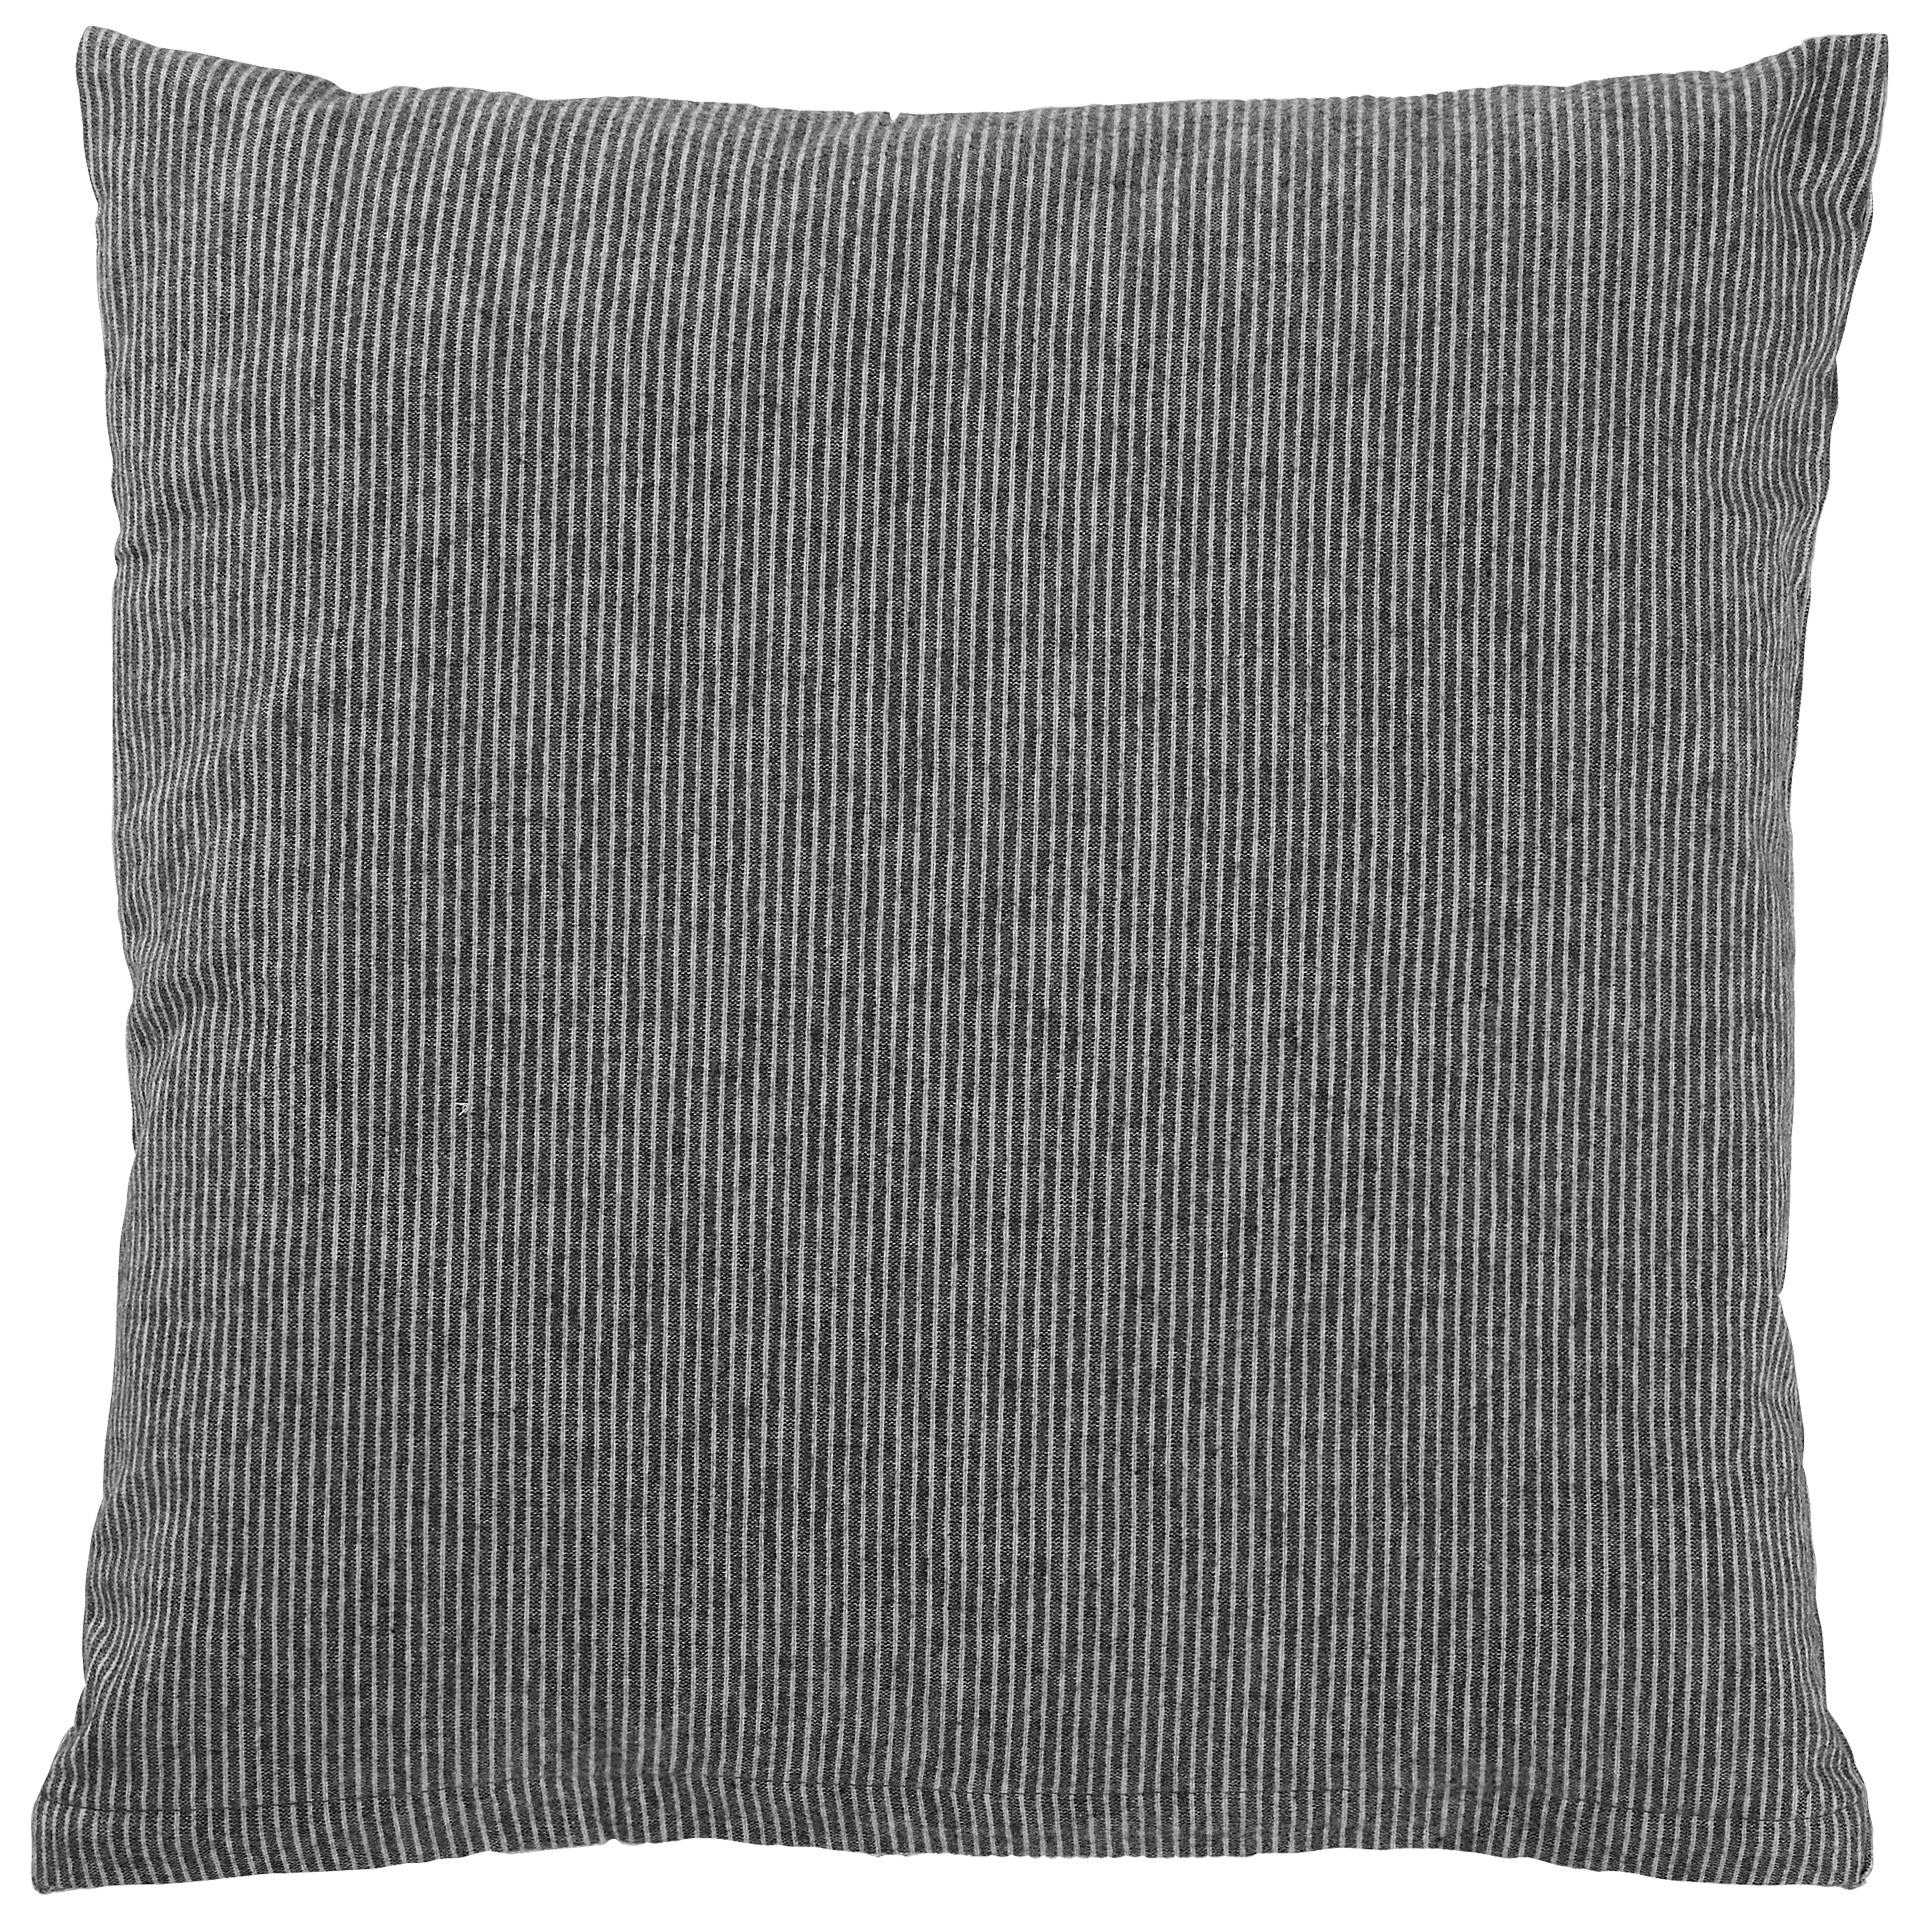 Feinbiber-Zierkissenbezug (50x50, Streifen, grau)